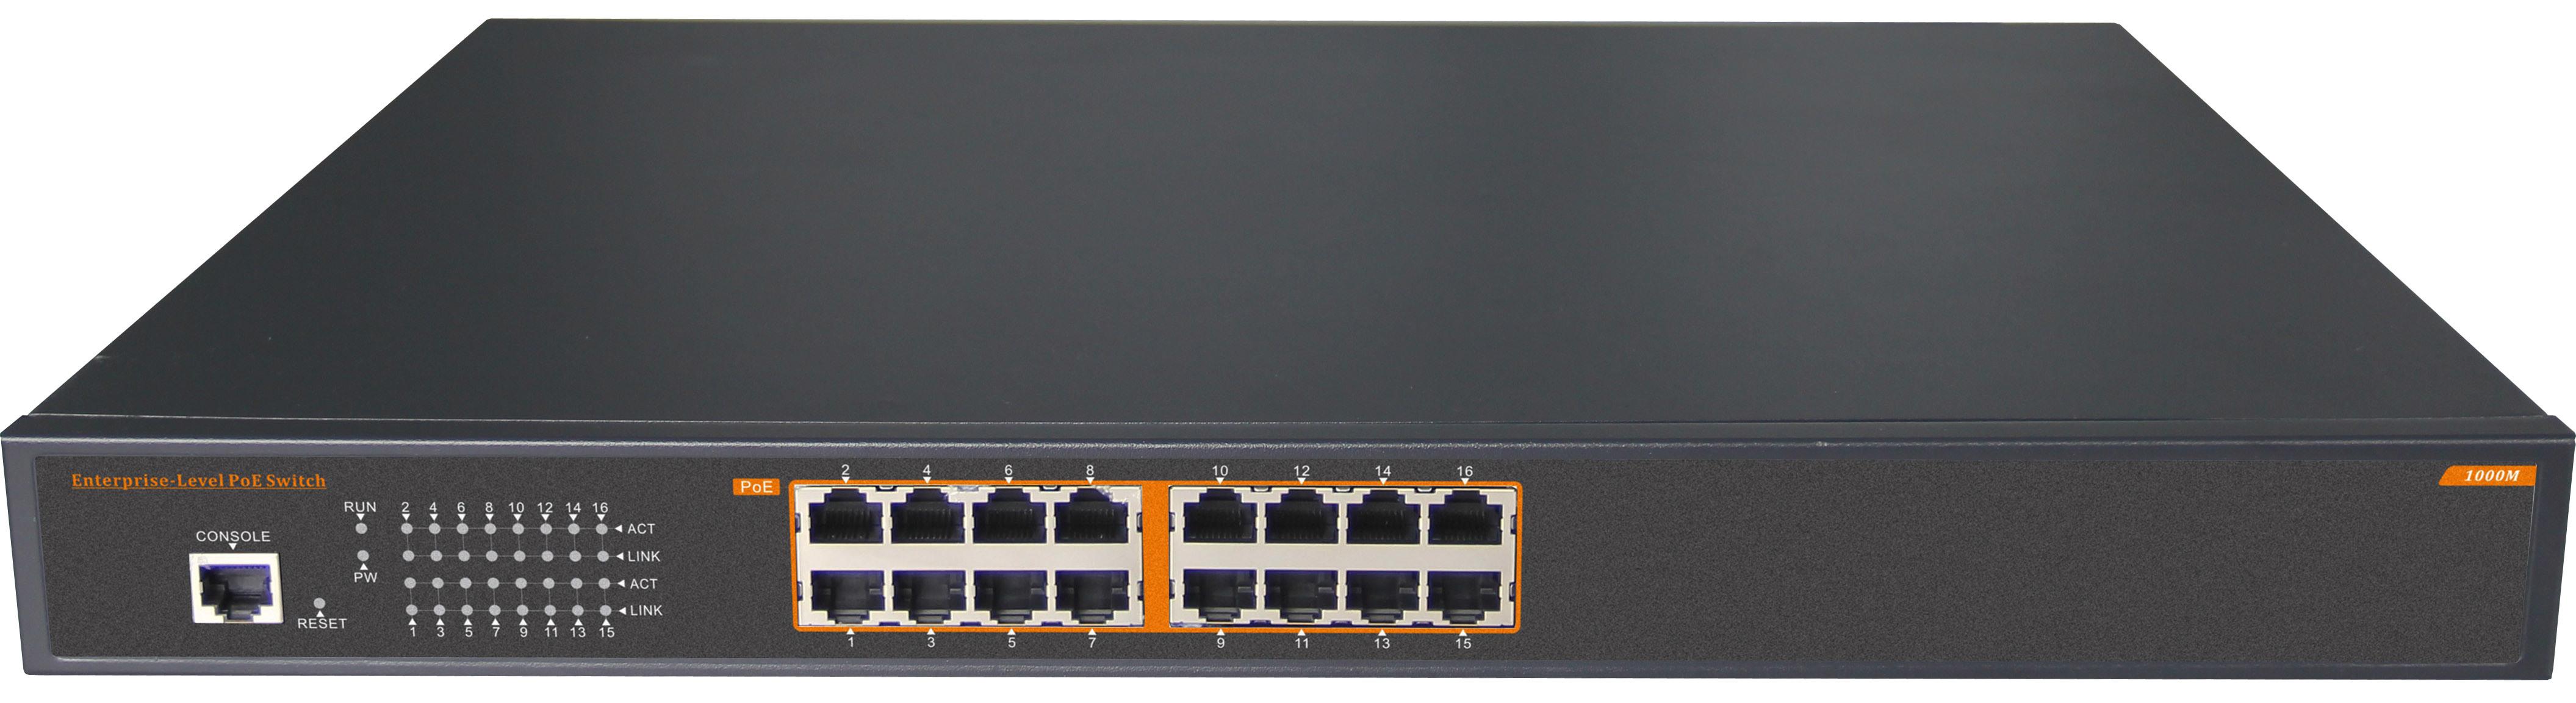 16 Port 802.3at Powered Gigabit Poe Ethernet Network Switch